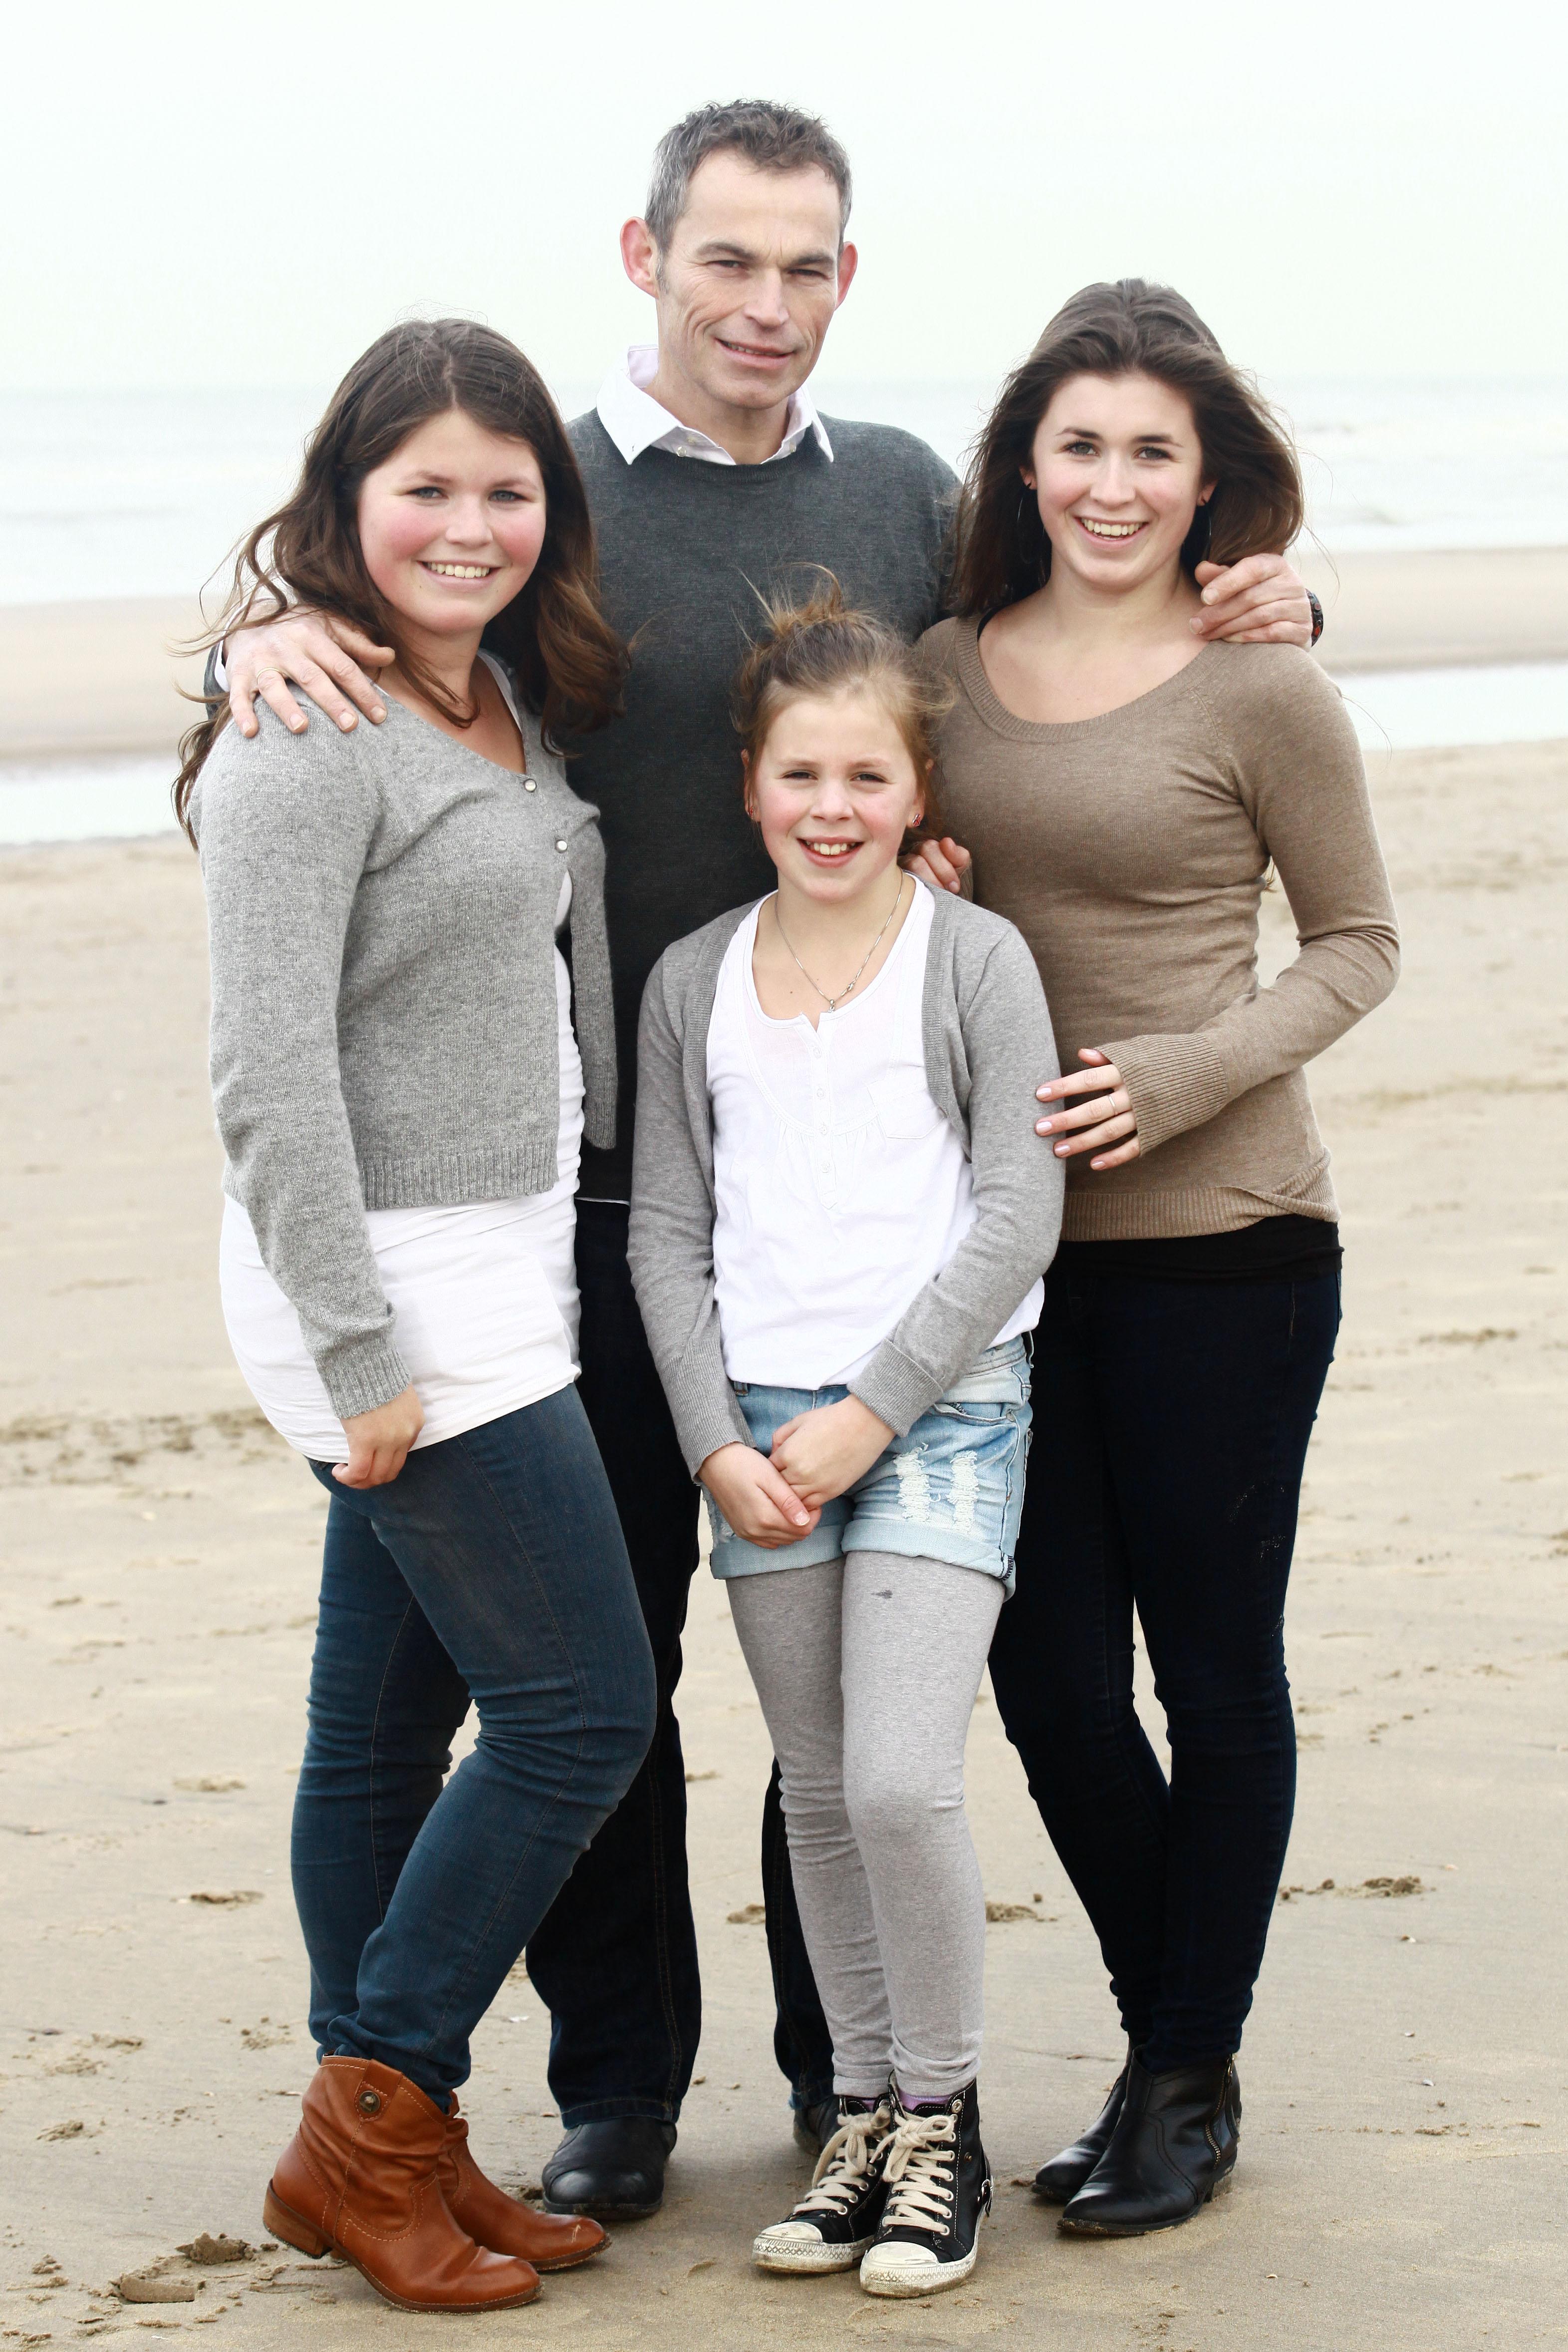 fotoshootfamilie